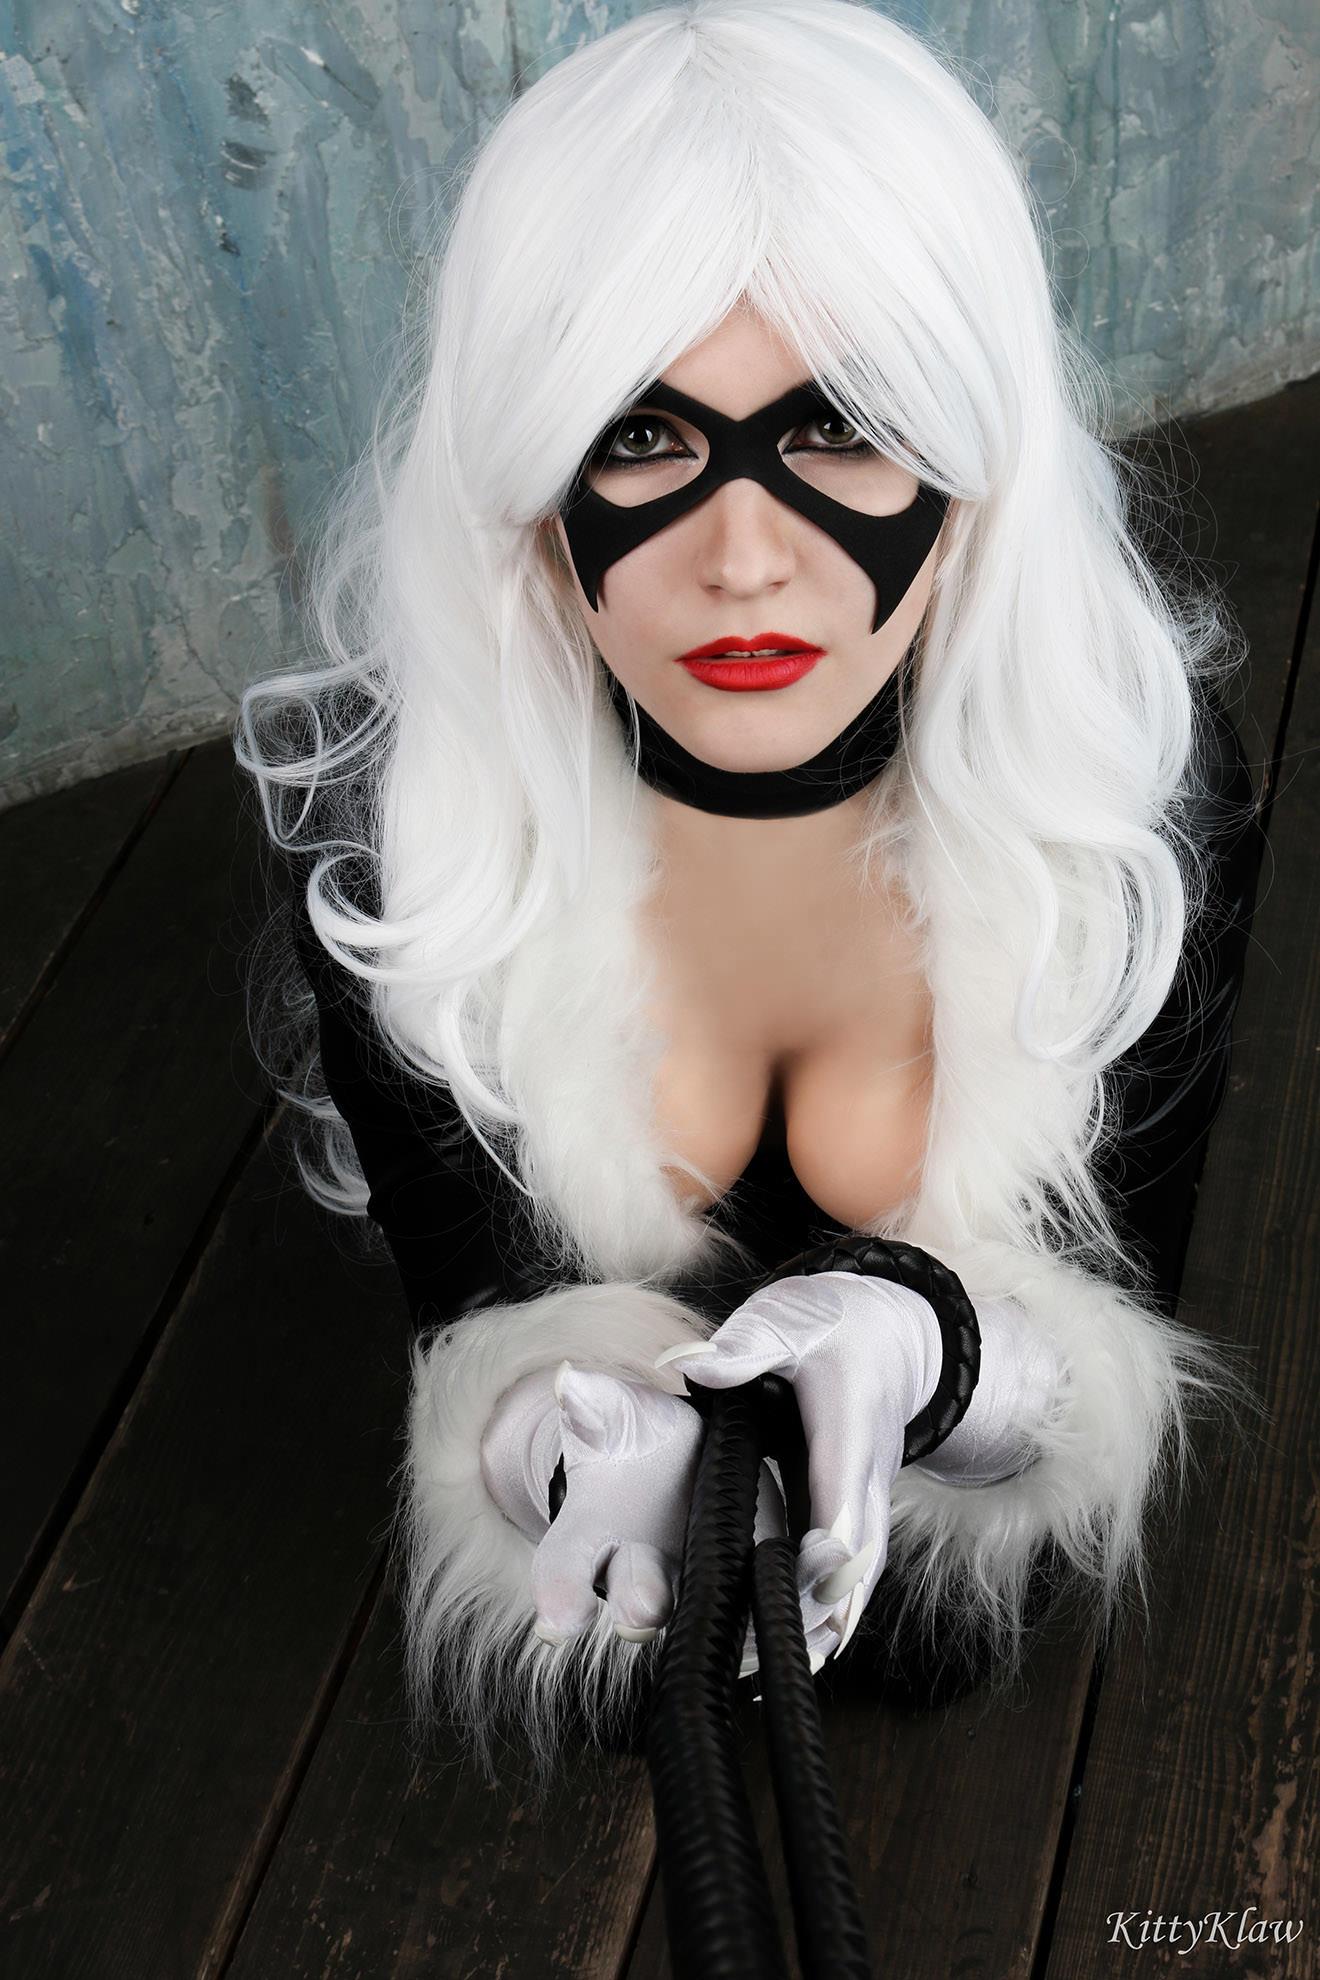 Klaw nackt kitty asmr Asmr Kittyklaw